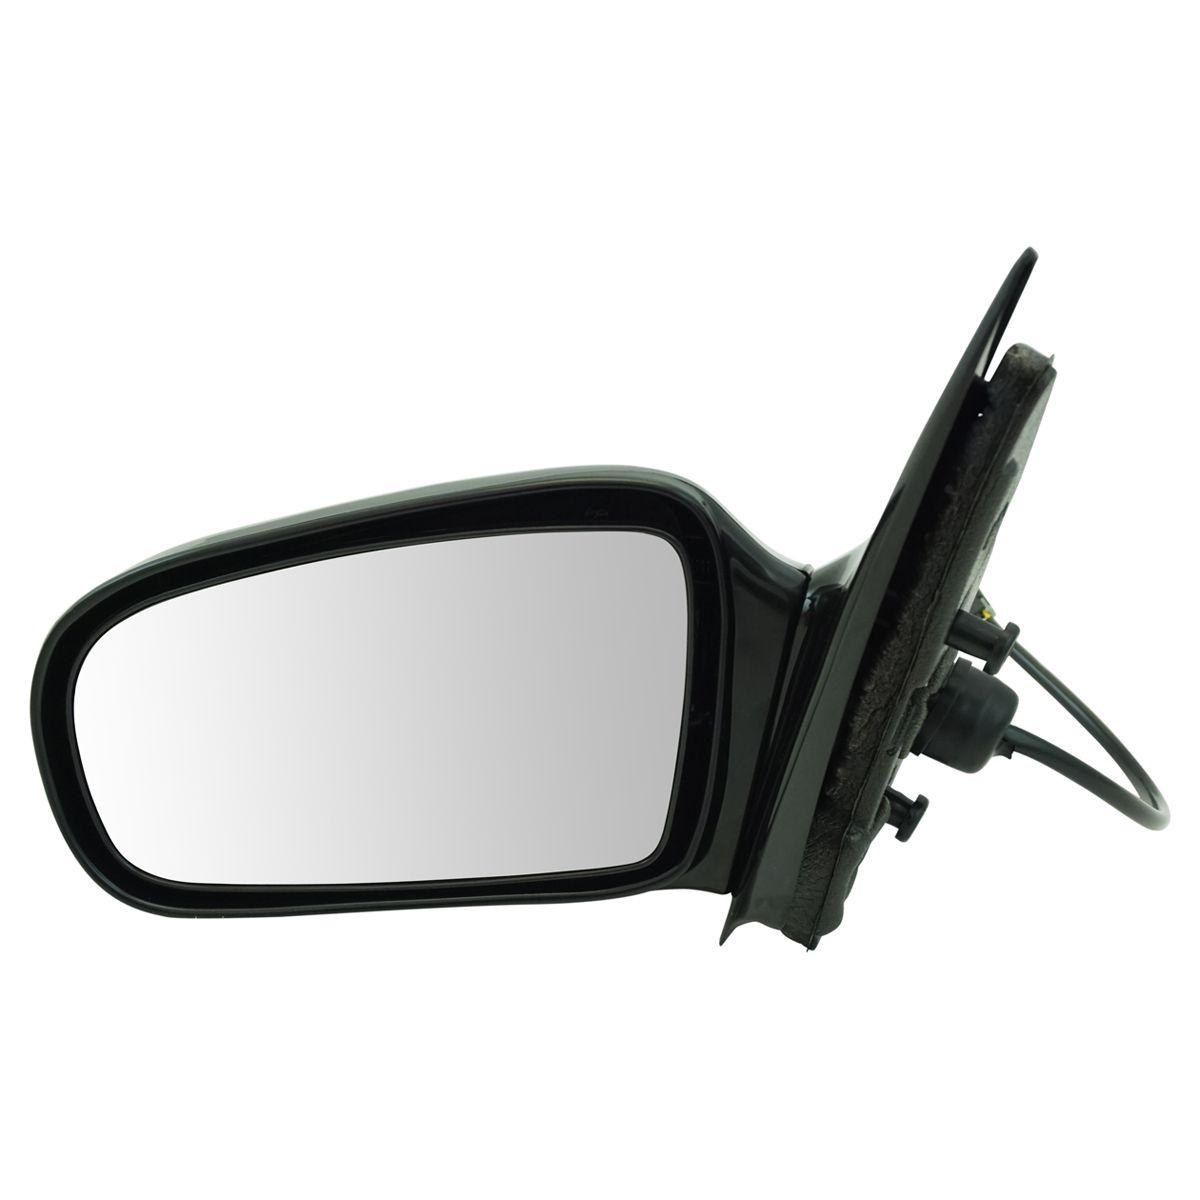 NEW Mirror Glass 95-05 CAVALIER SUNFIRE Passenger Side ***FAST SHIPPING***